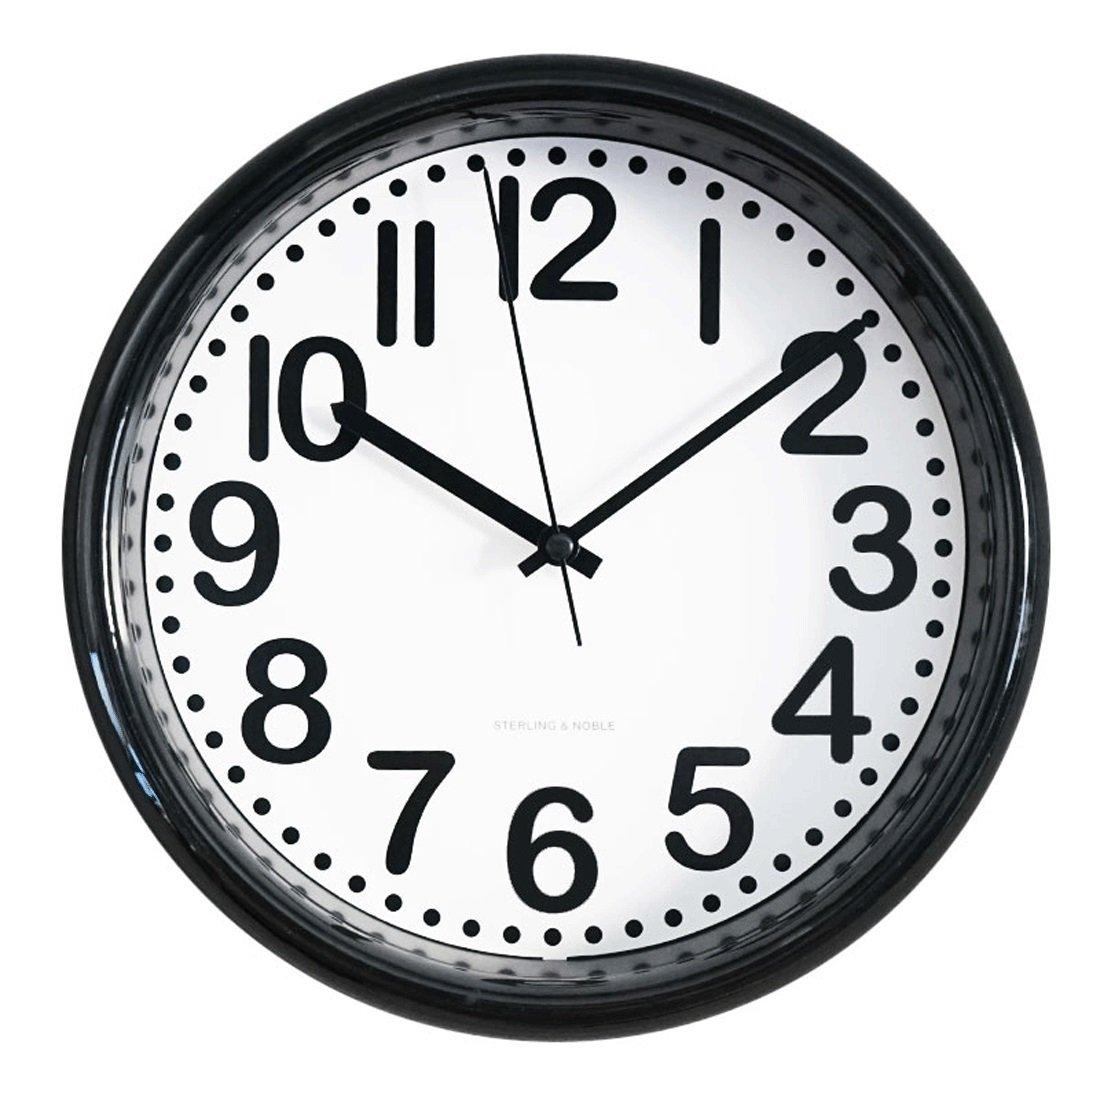 Amazon com 8 75 inch modern minimalist style wall clock living room bedroom fashion creative quartz clock round creative wall clock home kitchen